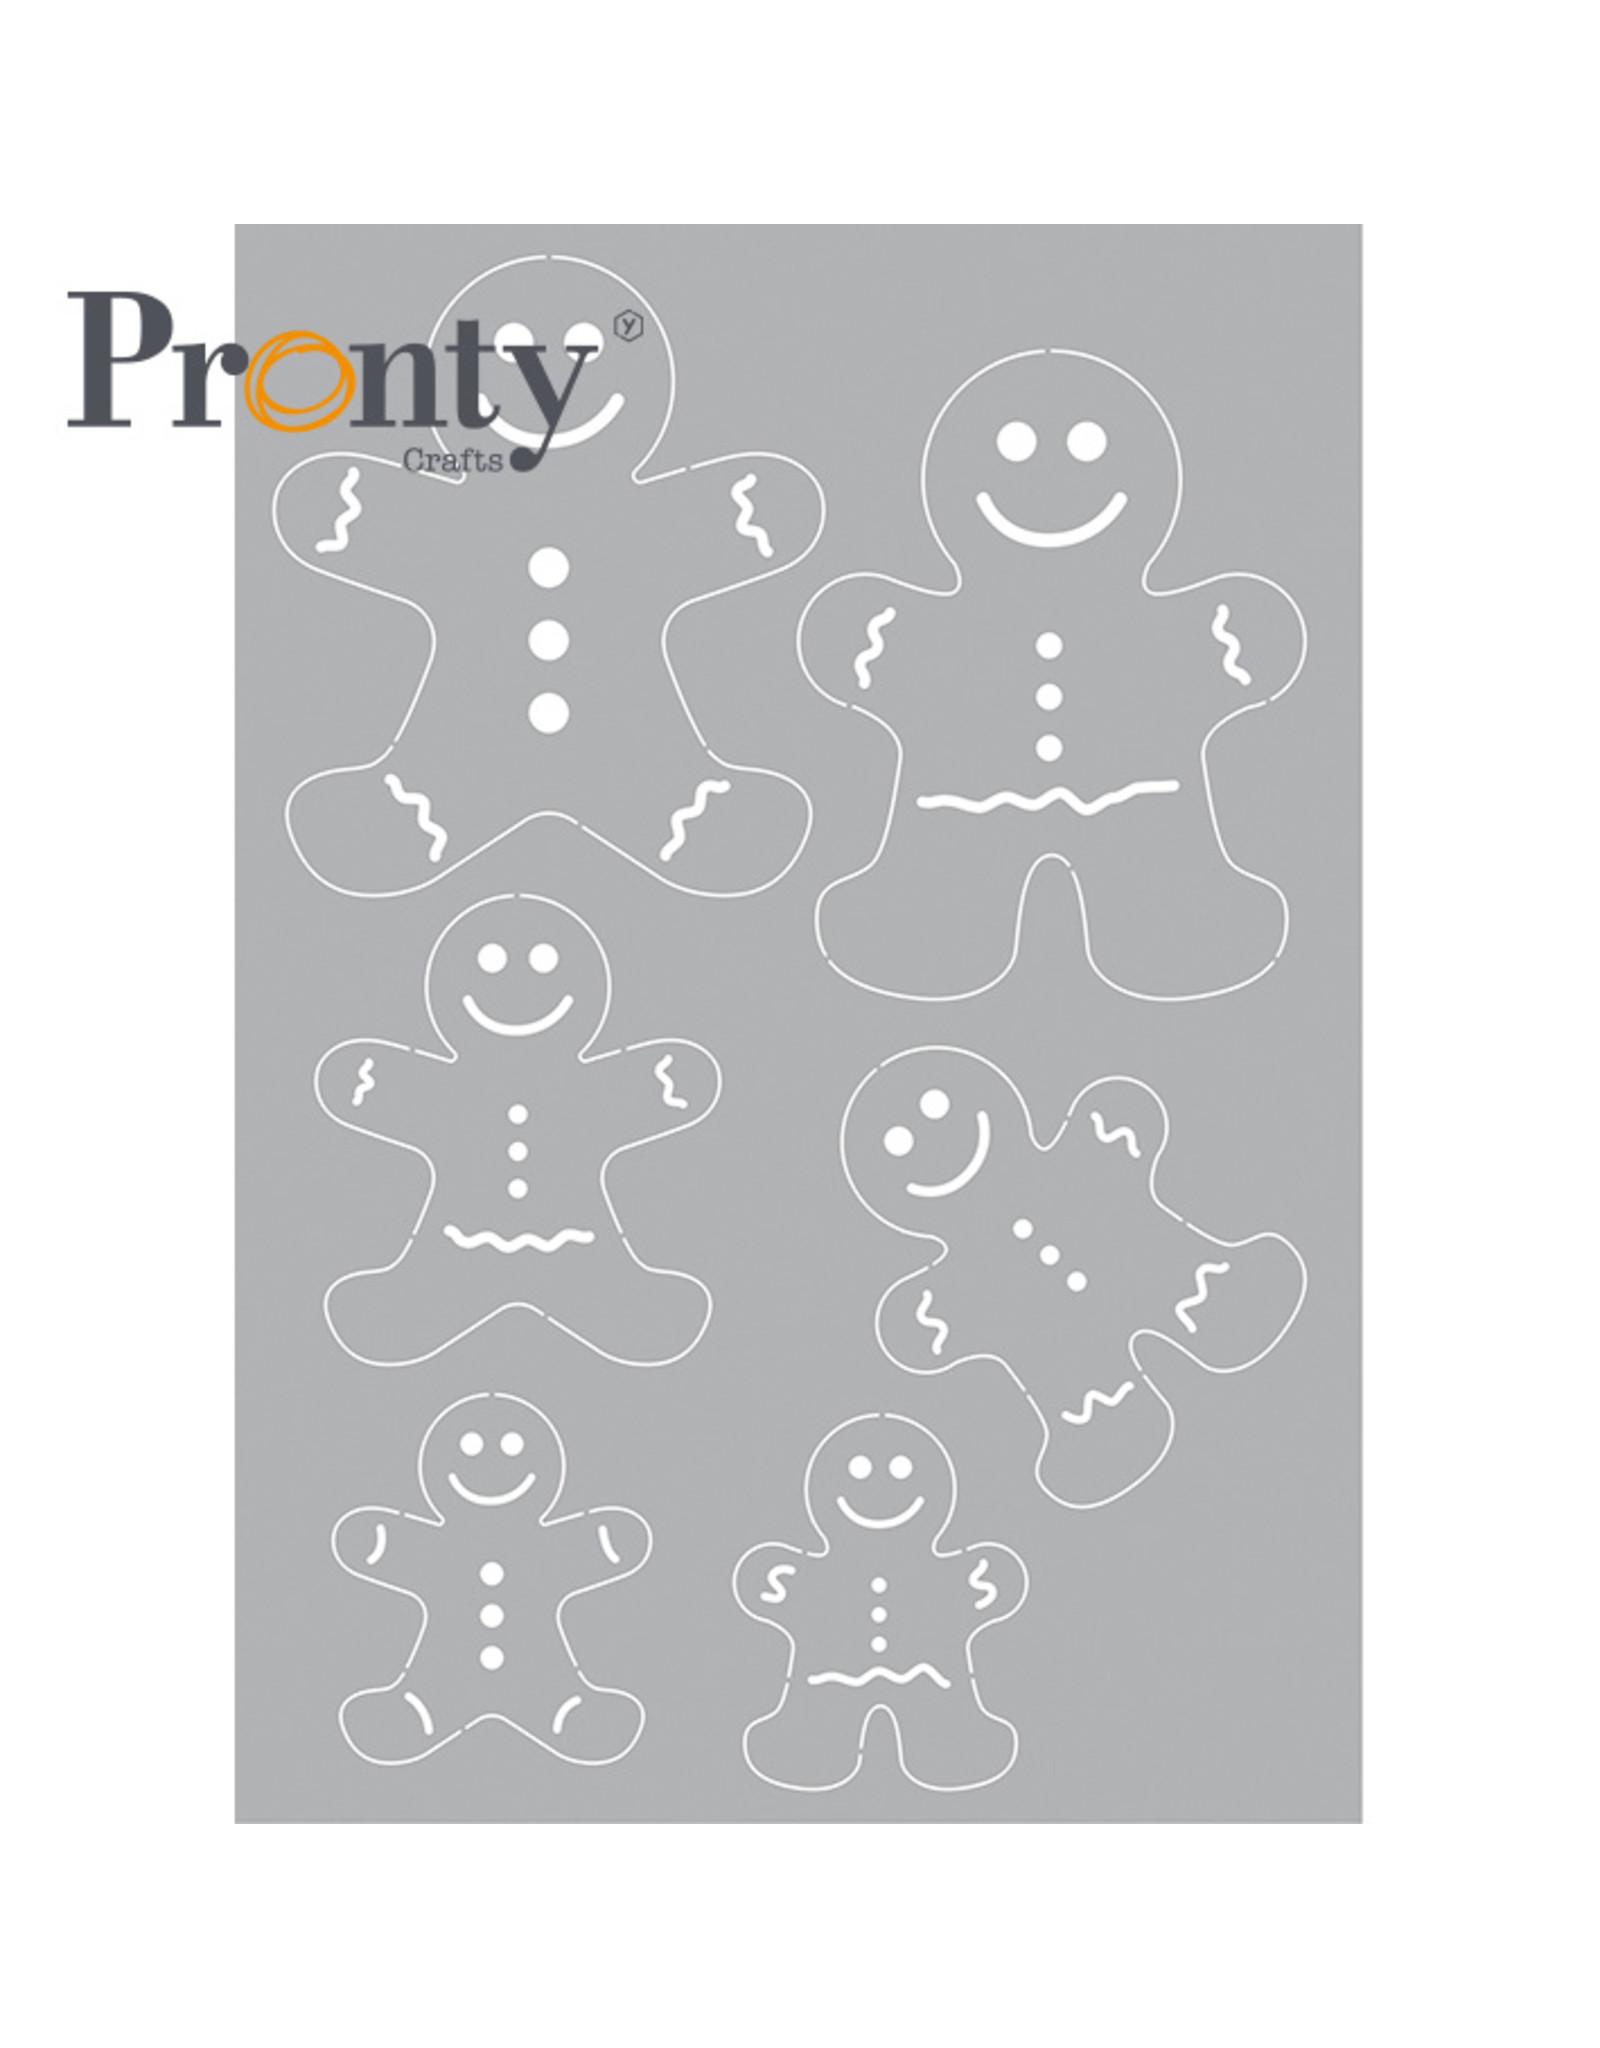 Pronty Crafts Stencil Gingerbread man A5